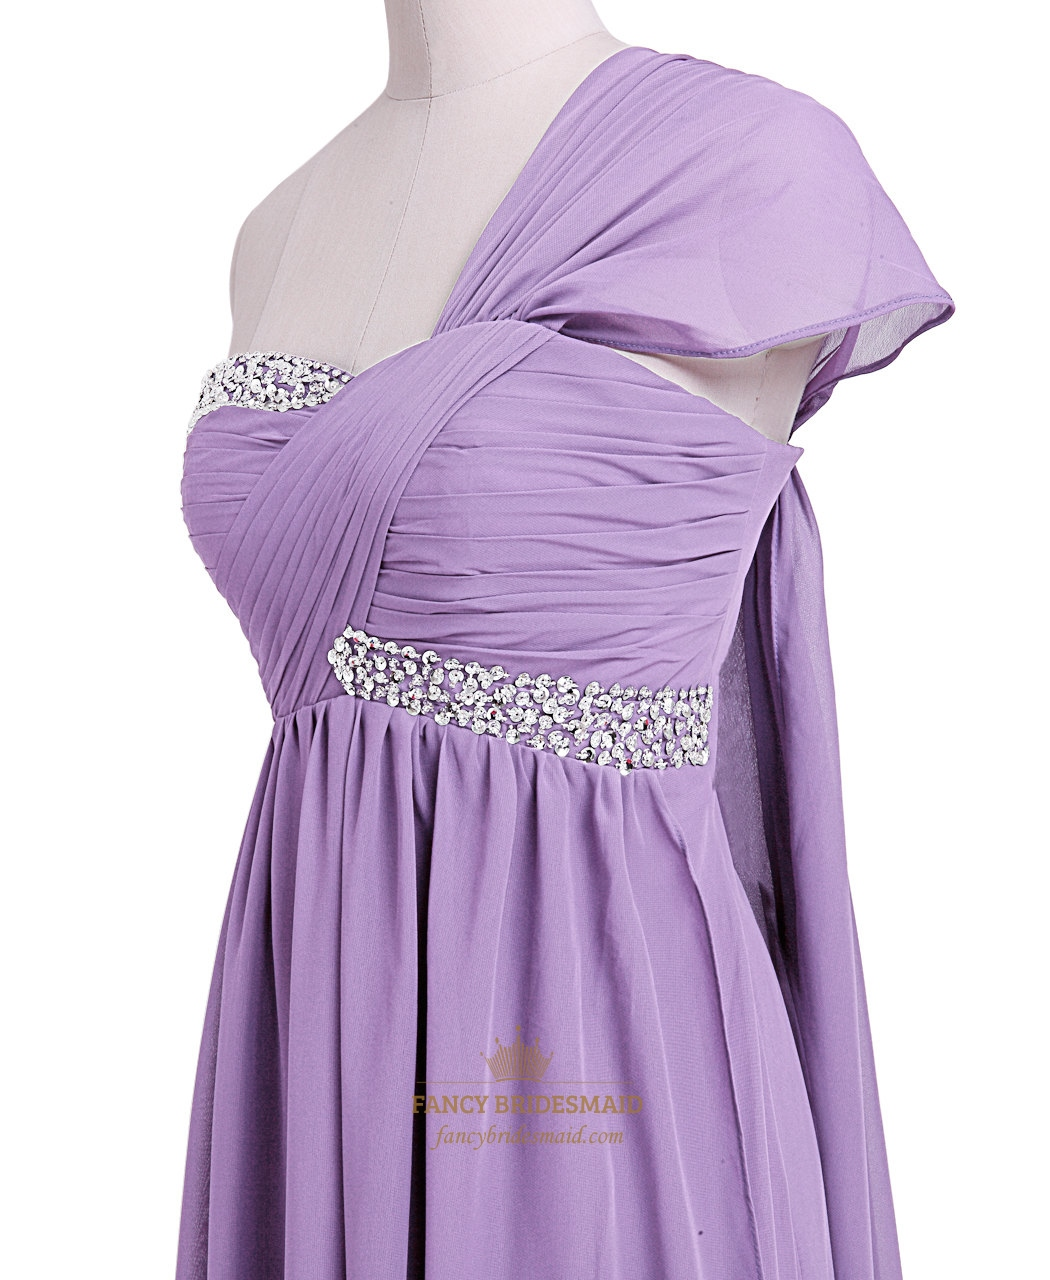 lilac beaded empire waist chiffon bridesmaid dress with